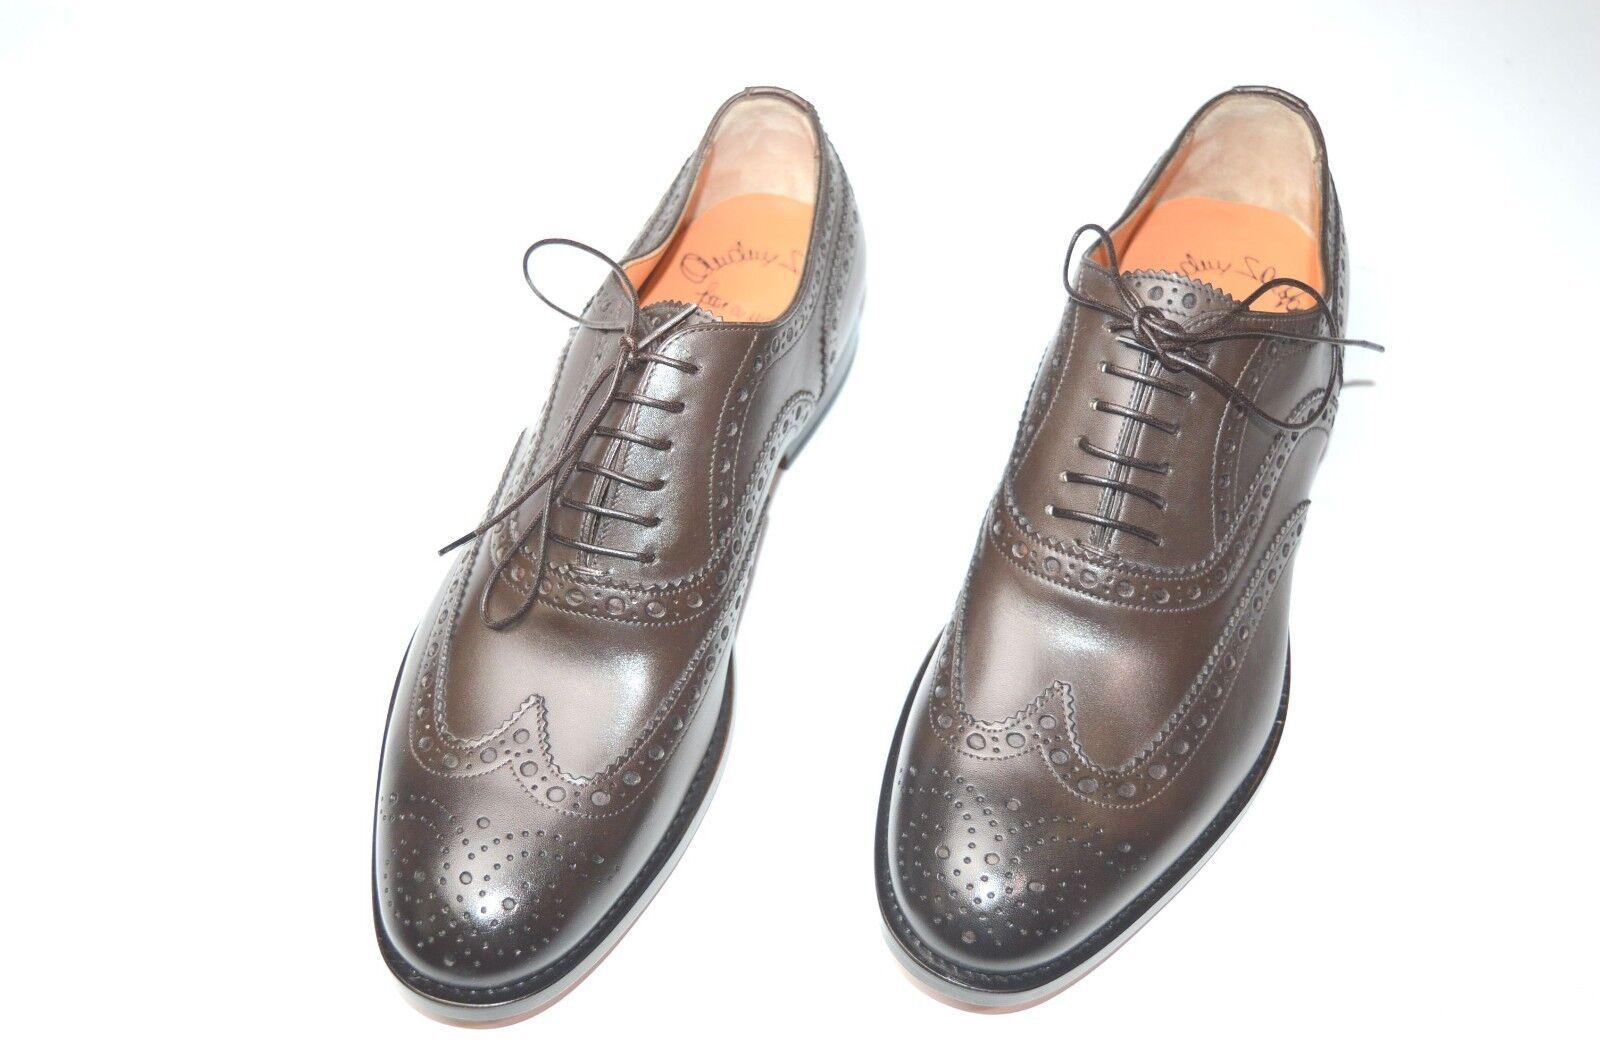 NEW SANTONI Dress braun Leather schuhe Größe Eu 44.5 Uk 10.5 Us 11.5 (50R)